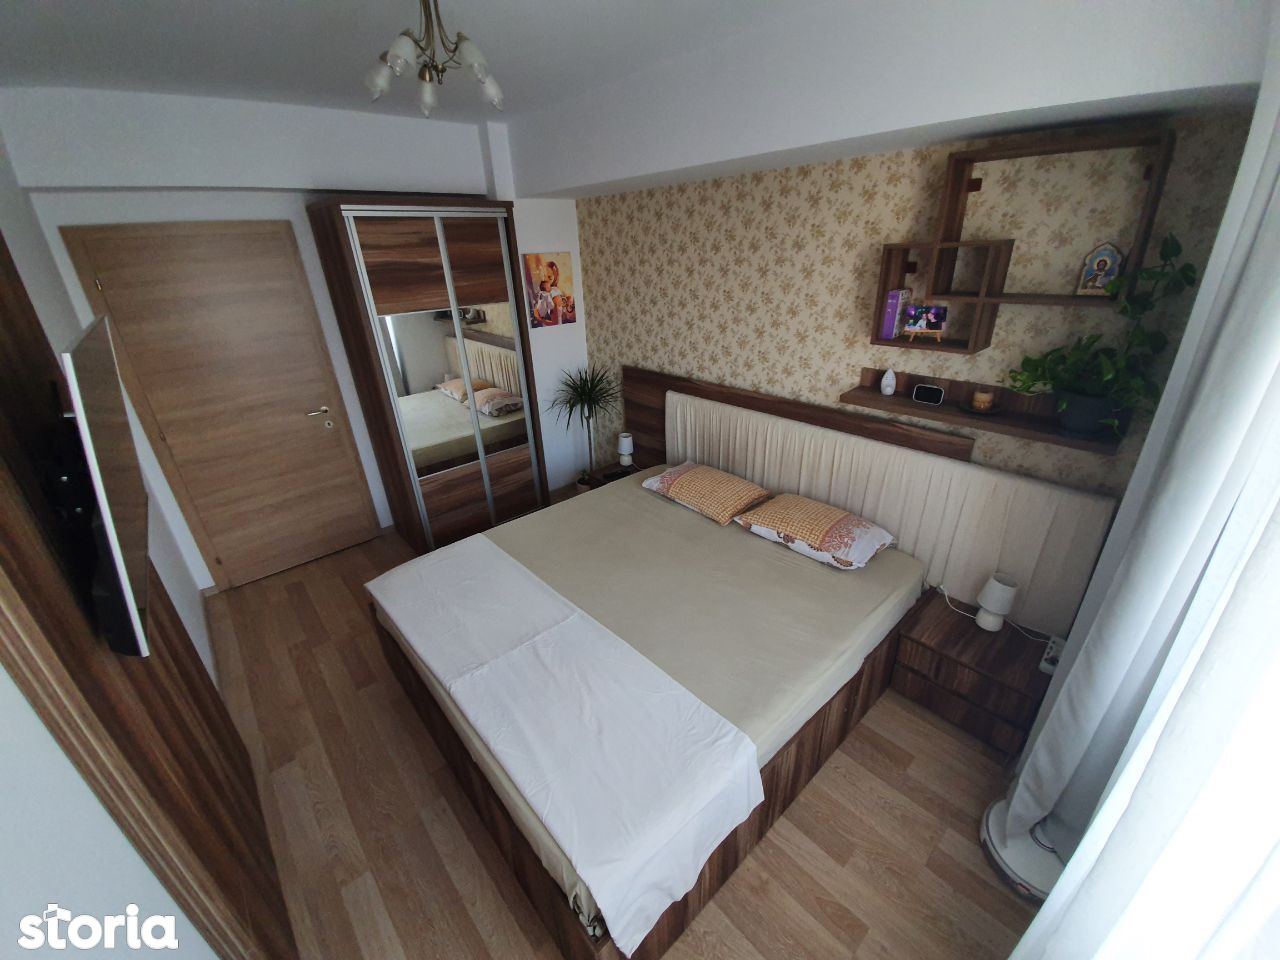 Apartament 2 camere, 51.15 mp, an 2015, sect. 4, parcare subterana